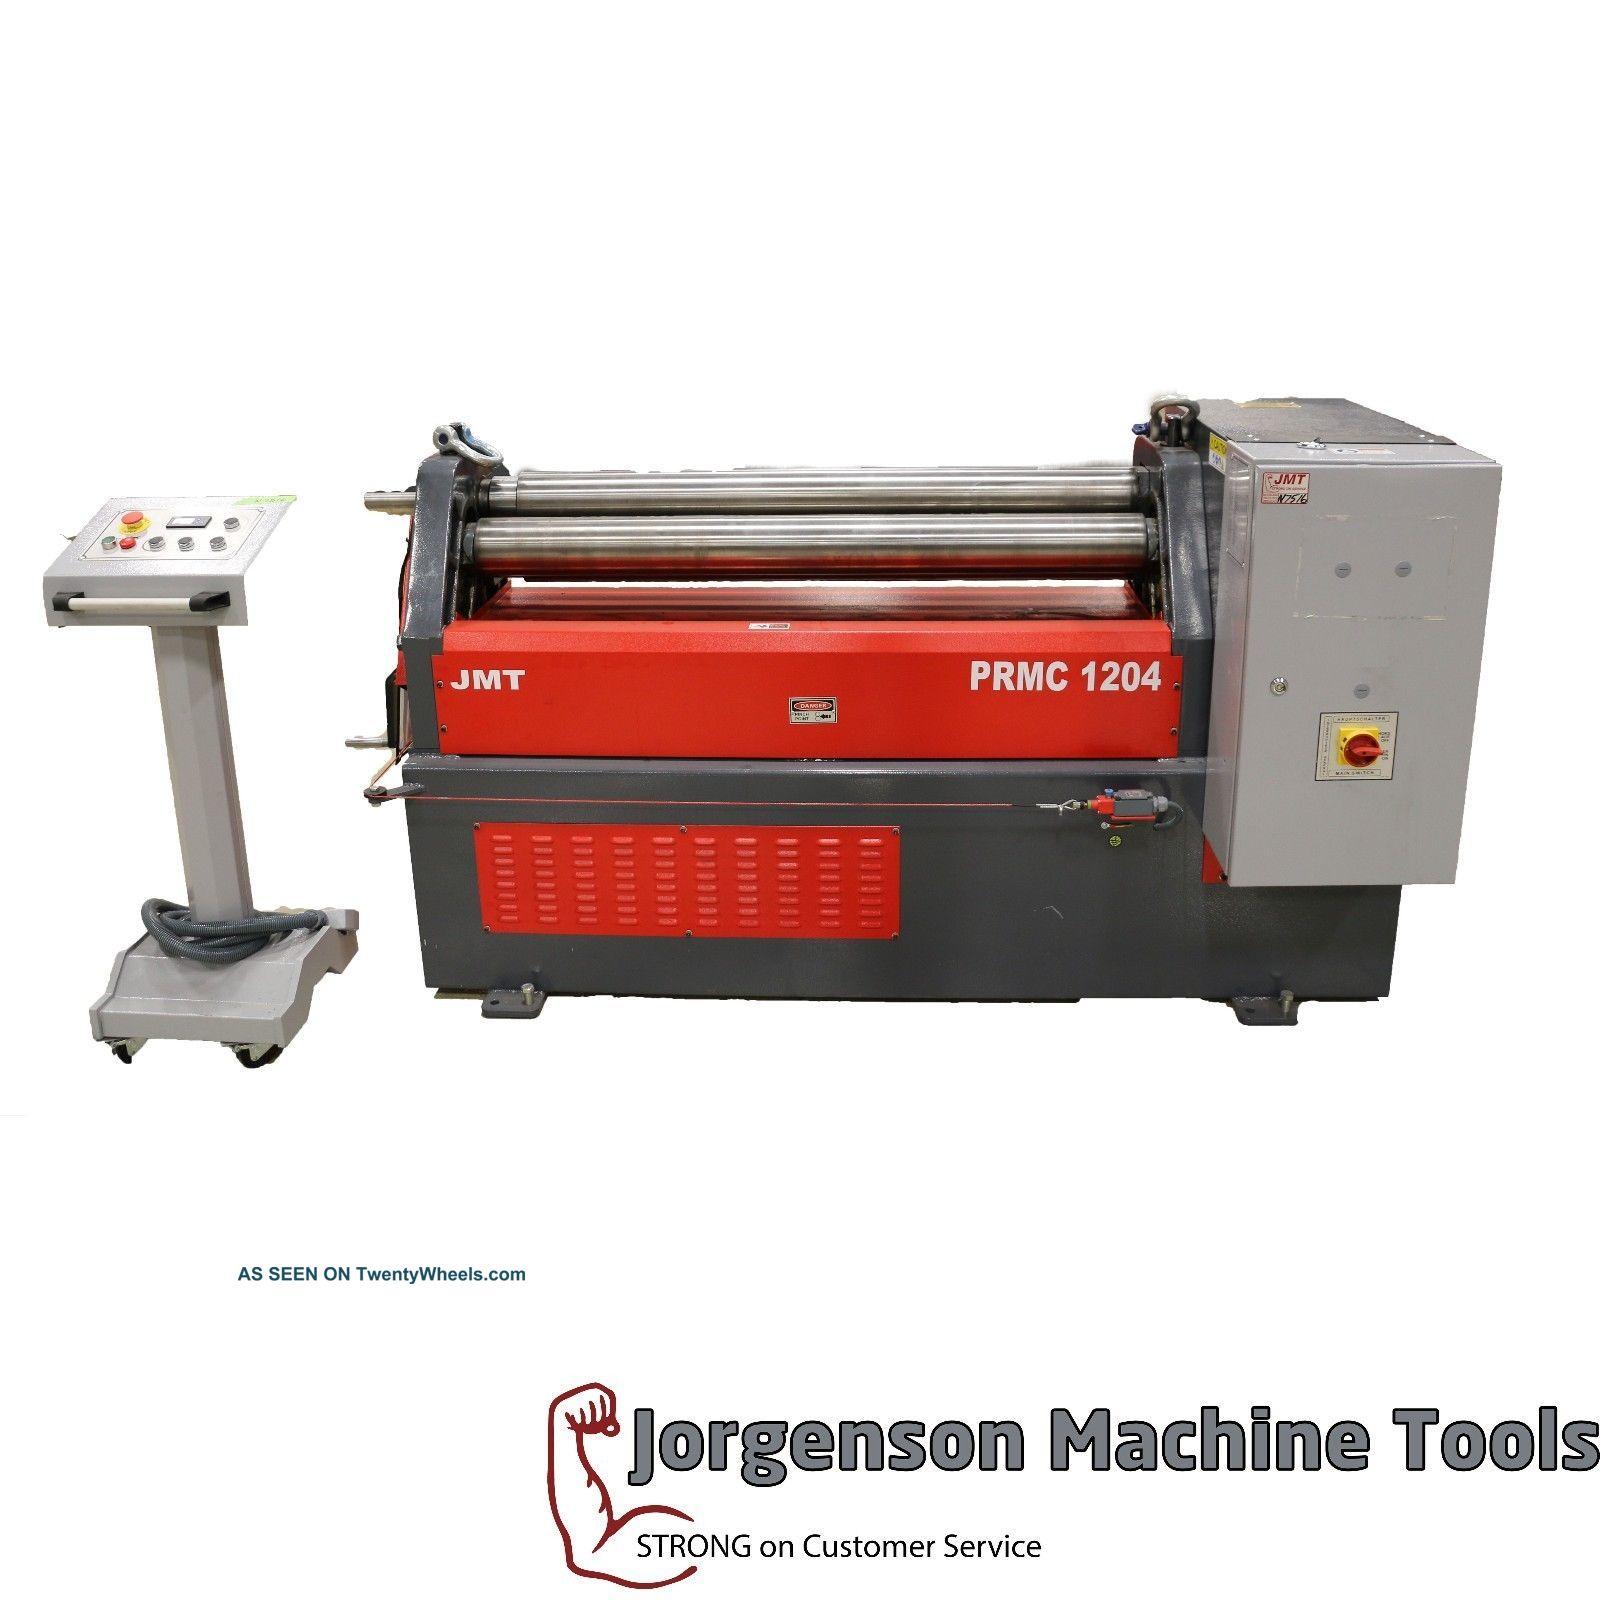 Jmt - Mrb 1204 Plate Roll Metal Bending Machines photo